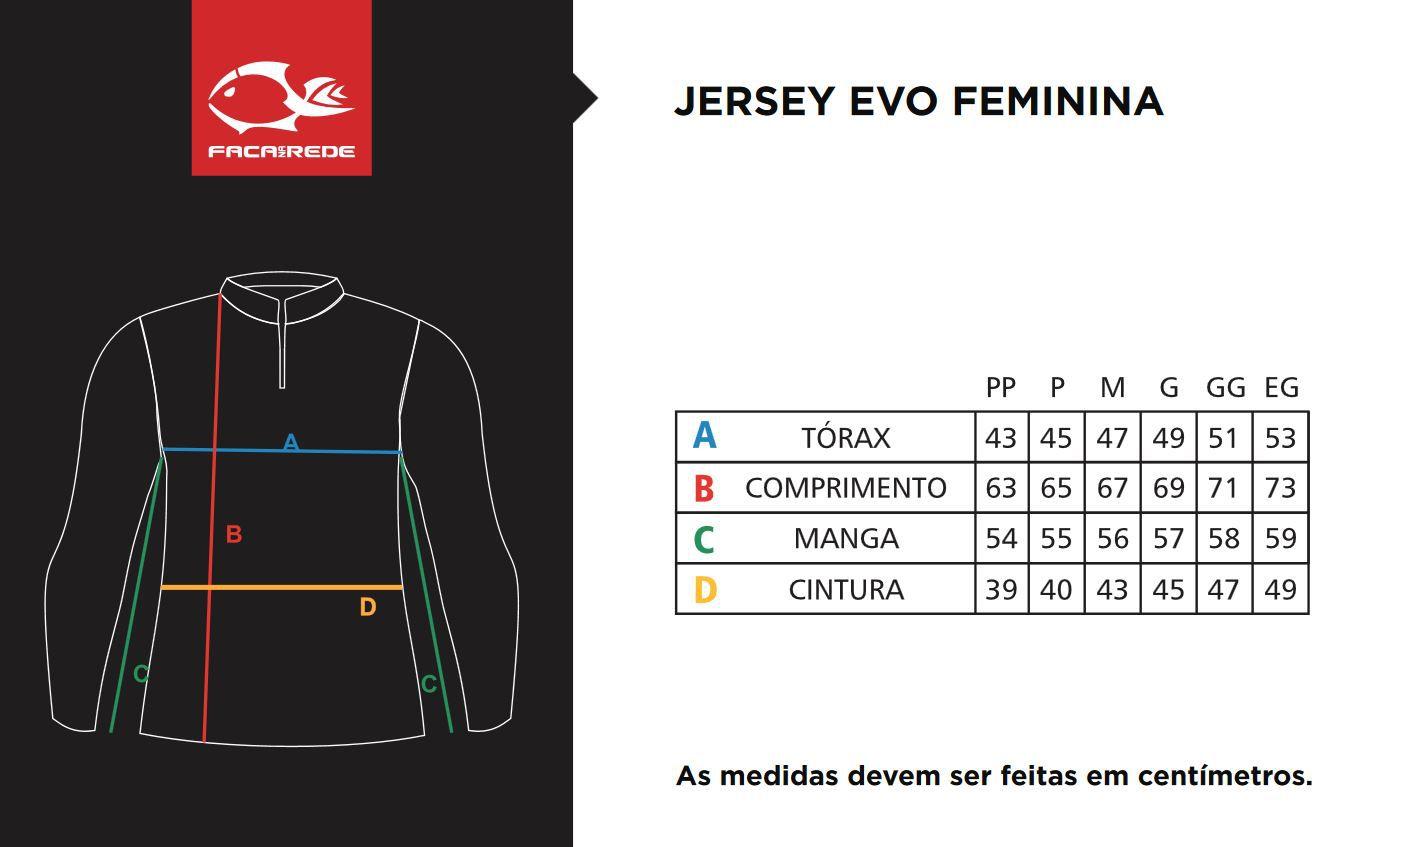 Camiseta de Pesca Feminina Faca na Rede EVO Girl Tucunaré Azul  - Life Pesca - Sua loja de Pesca, Camping e Lazer